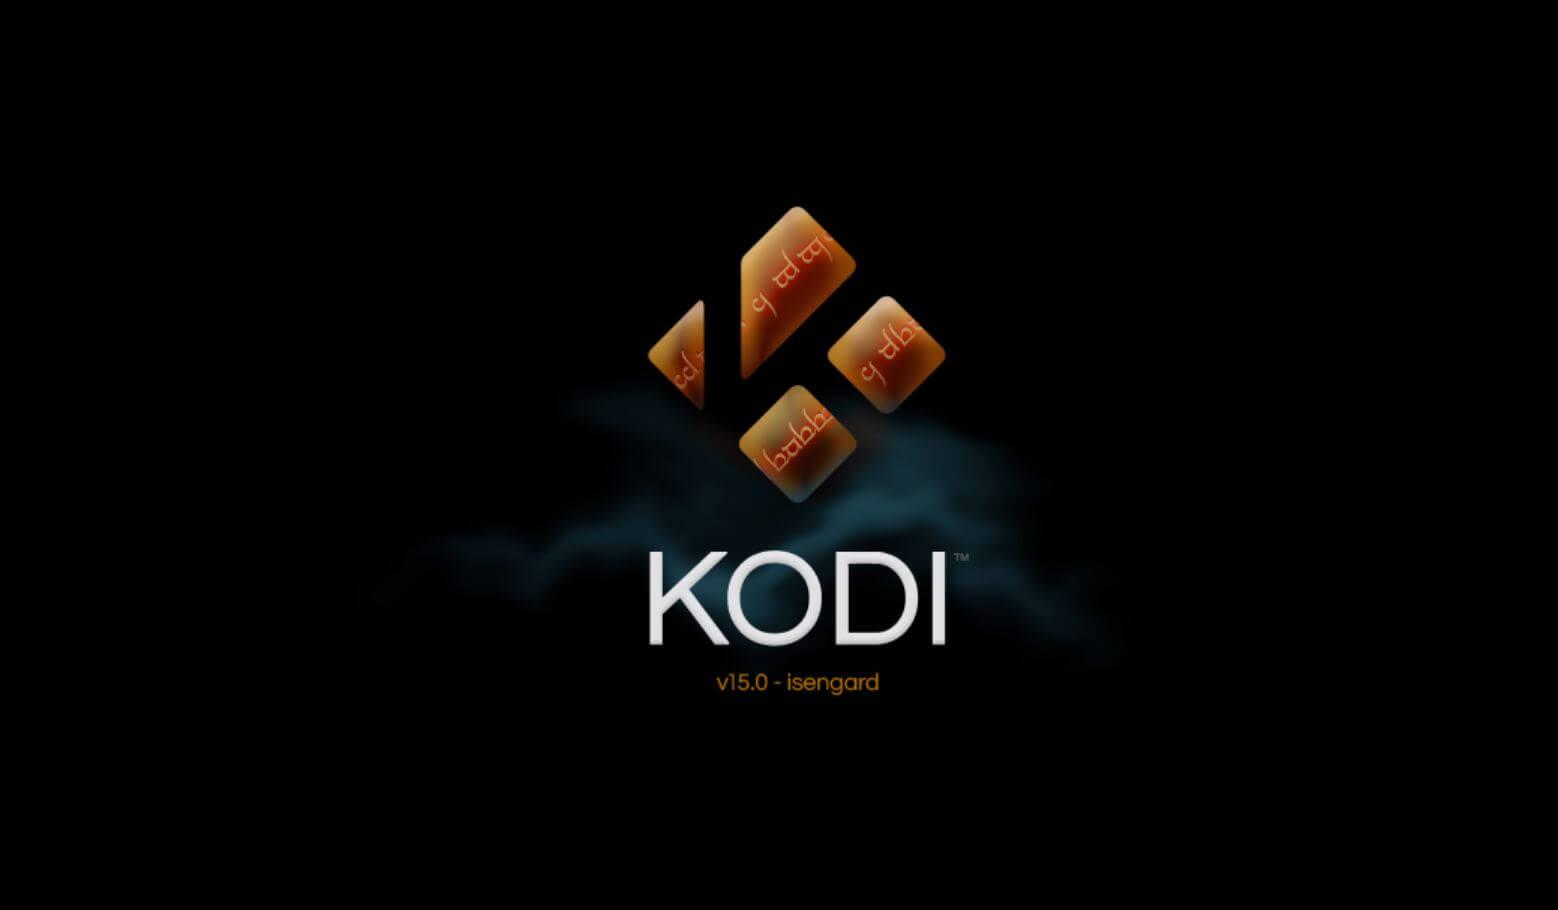 Part 2: Begin With Kodi - Start Up Screen